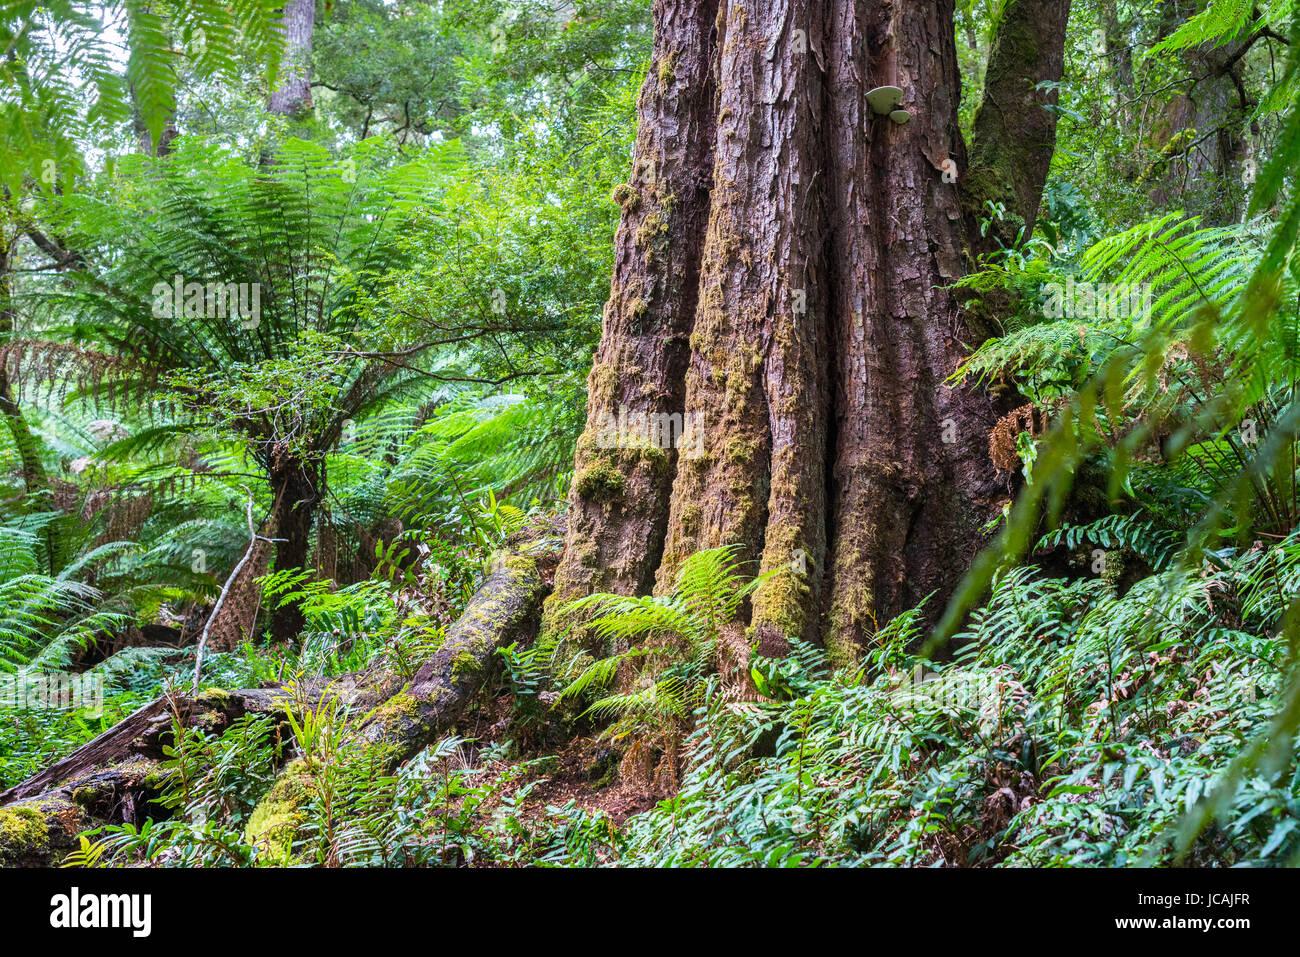 Dicksonia antarctica Regenwald an Melba Gully State Park, Great Otway National Park, Victoria, Australien. Stockfoto